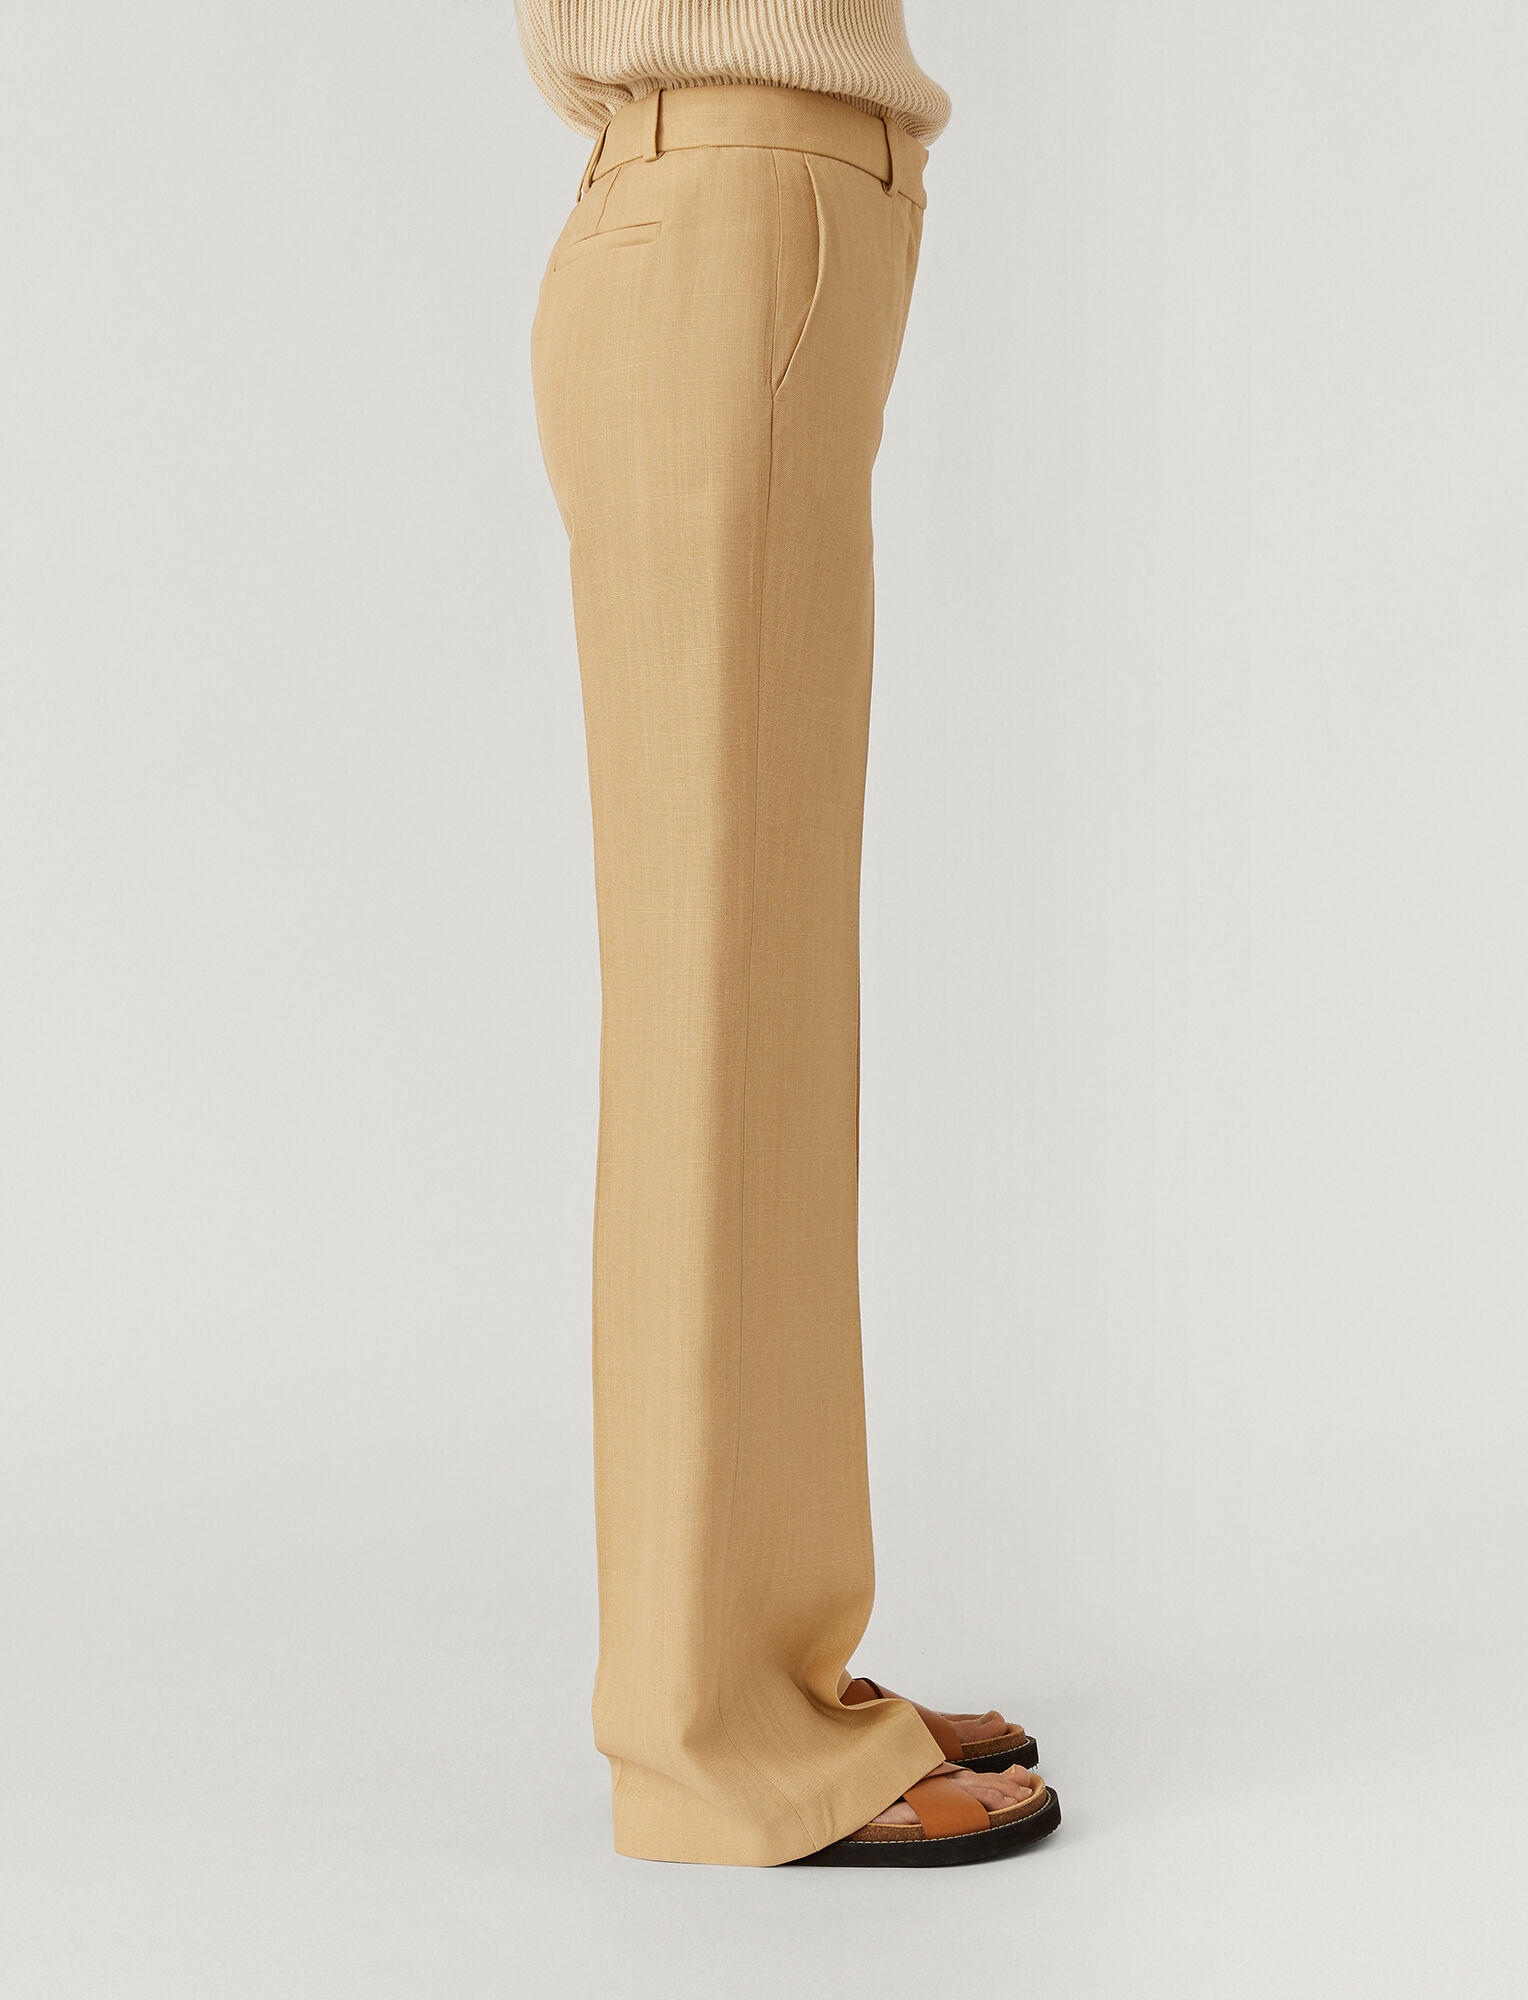 Joseph, Shantung Morissey Trousers, in NUDE